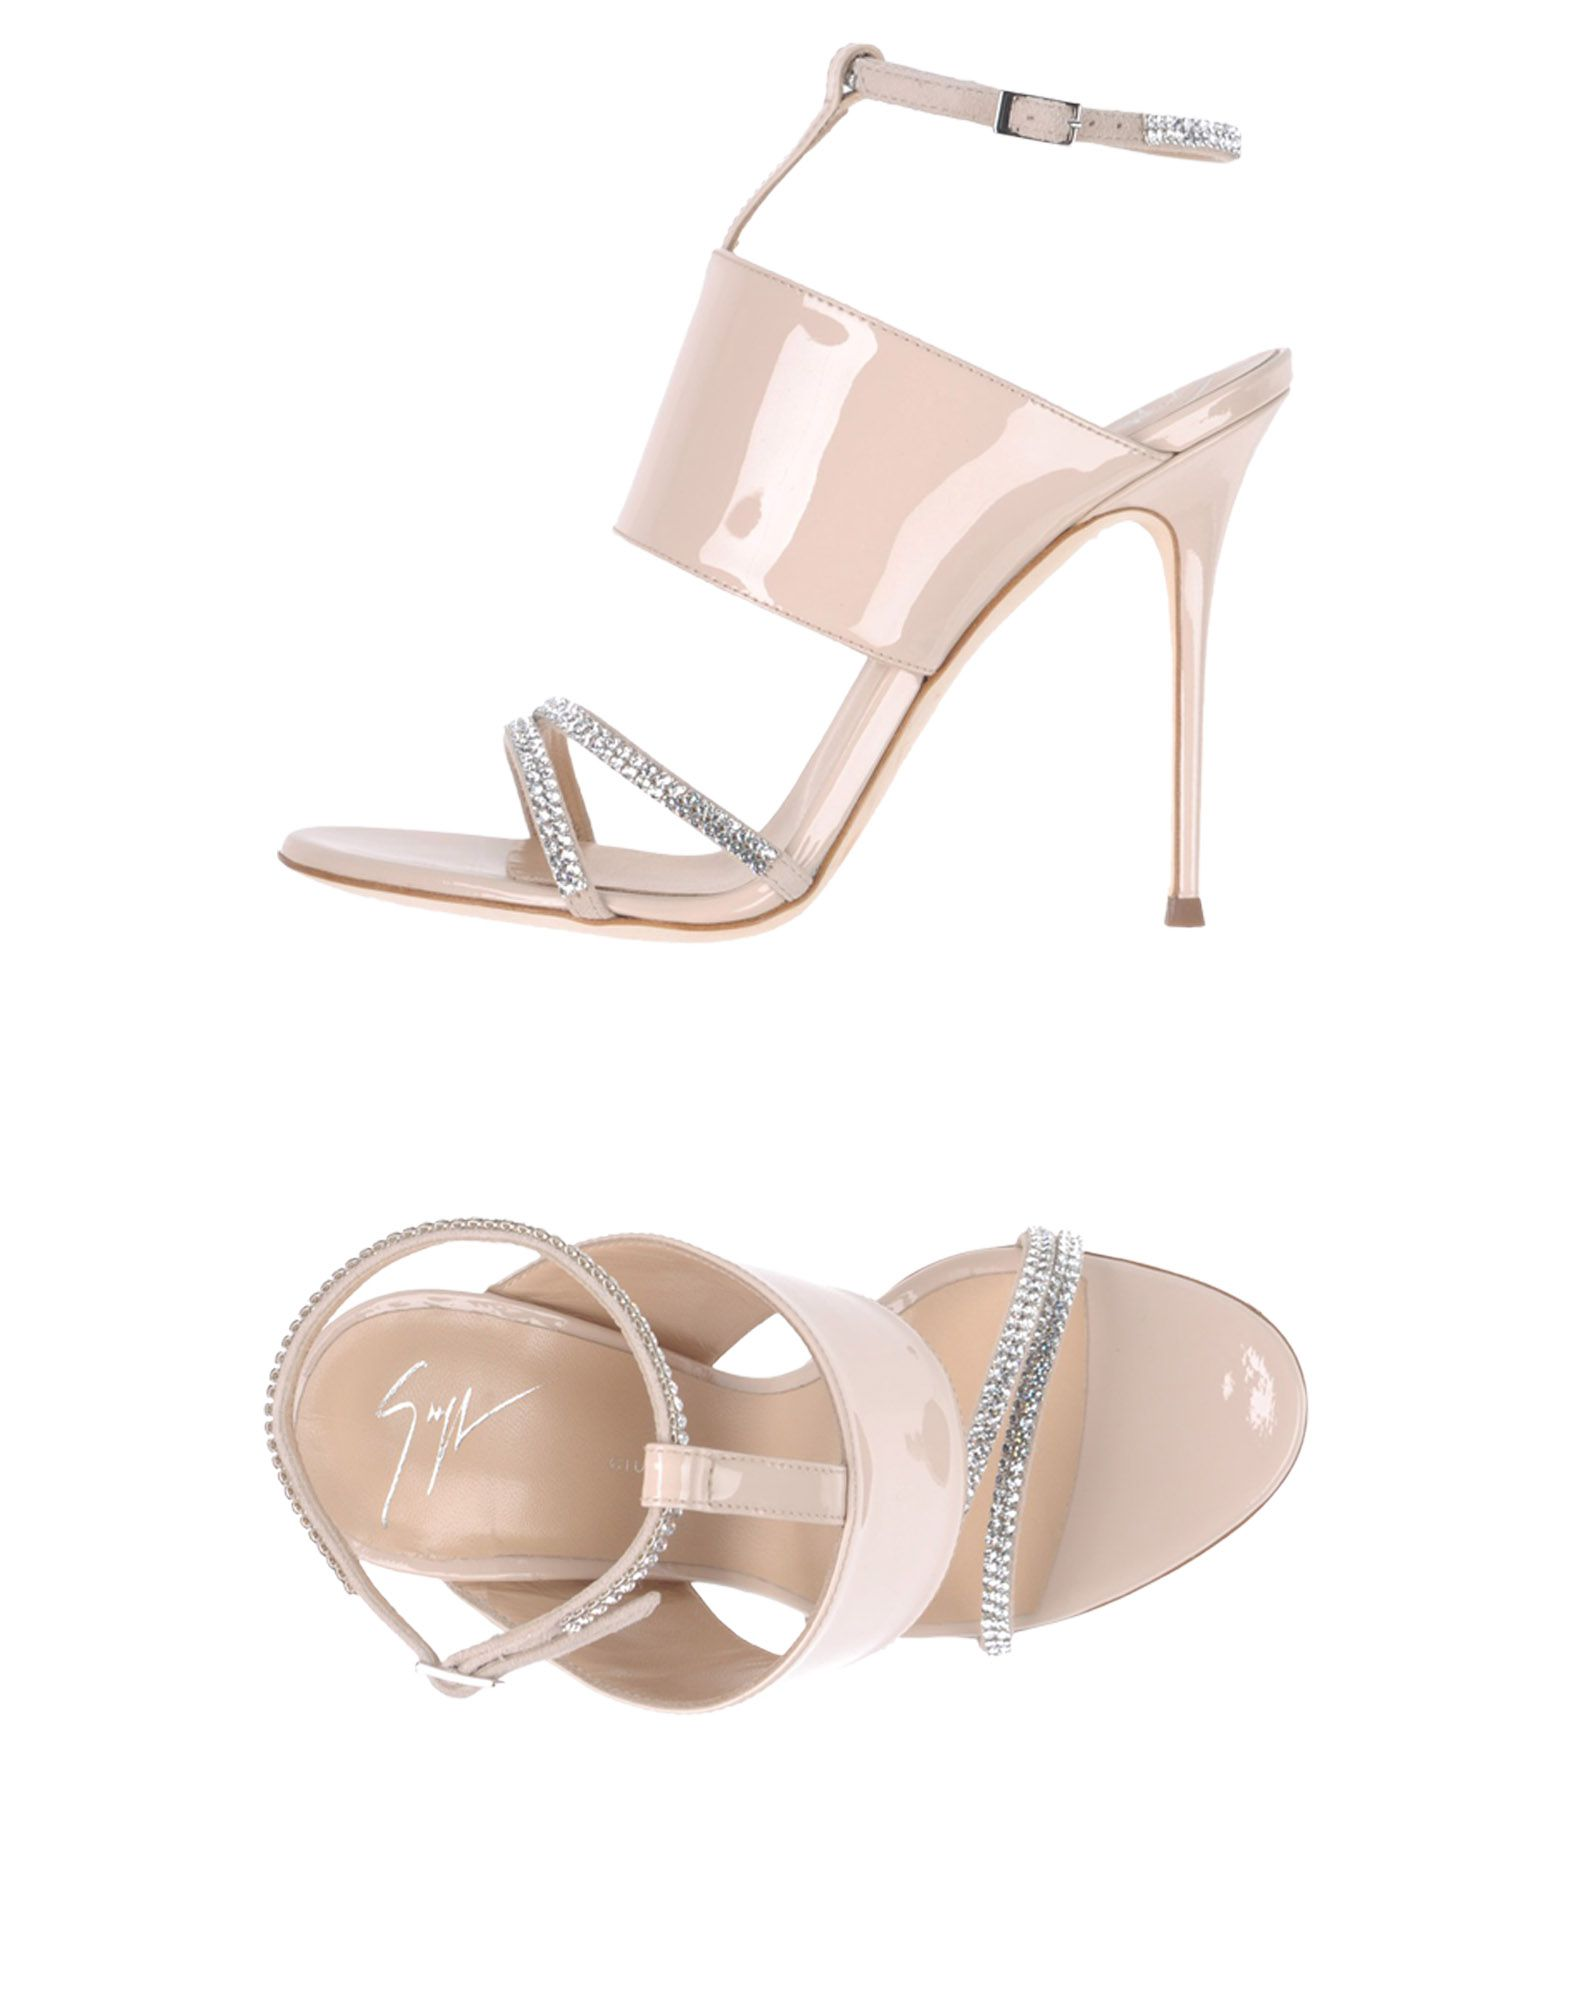 giuseppe zanotti sandales sandales zanotti - femmes giuseppe zanotti sandales en ligne sur canada 23769f